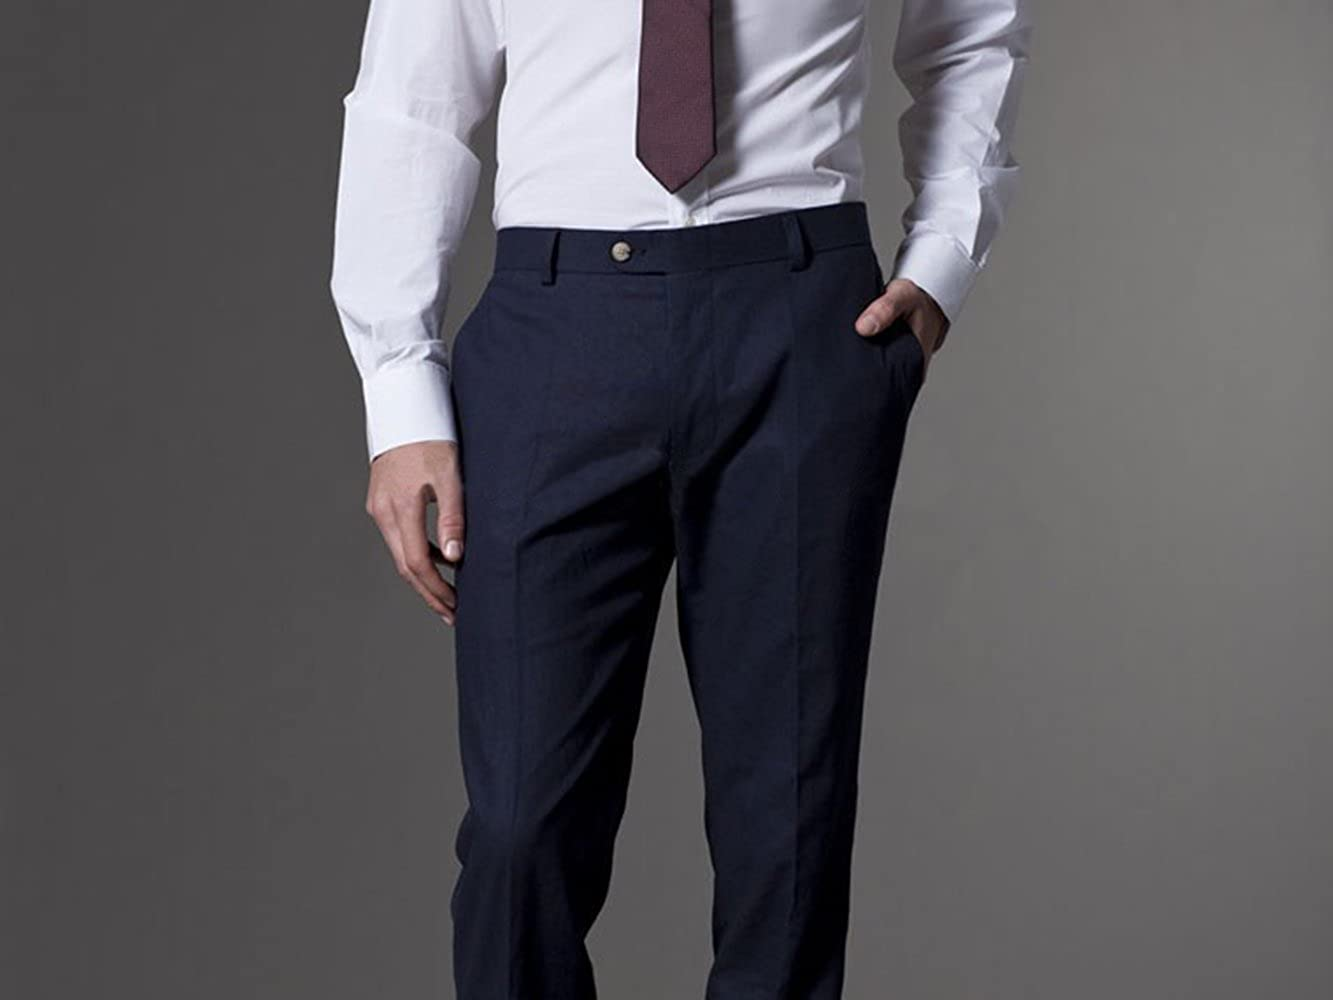 Wxili Mens Suit Two Piece Business Suits for Men Slim Fit Wedding 2018